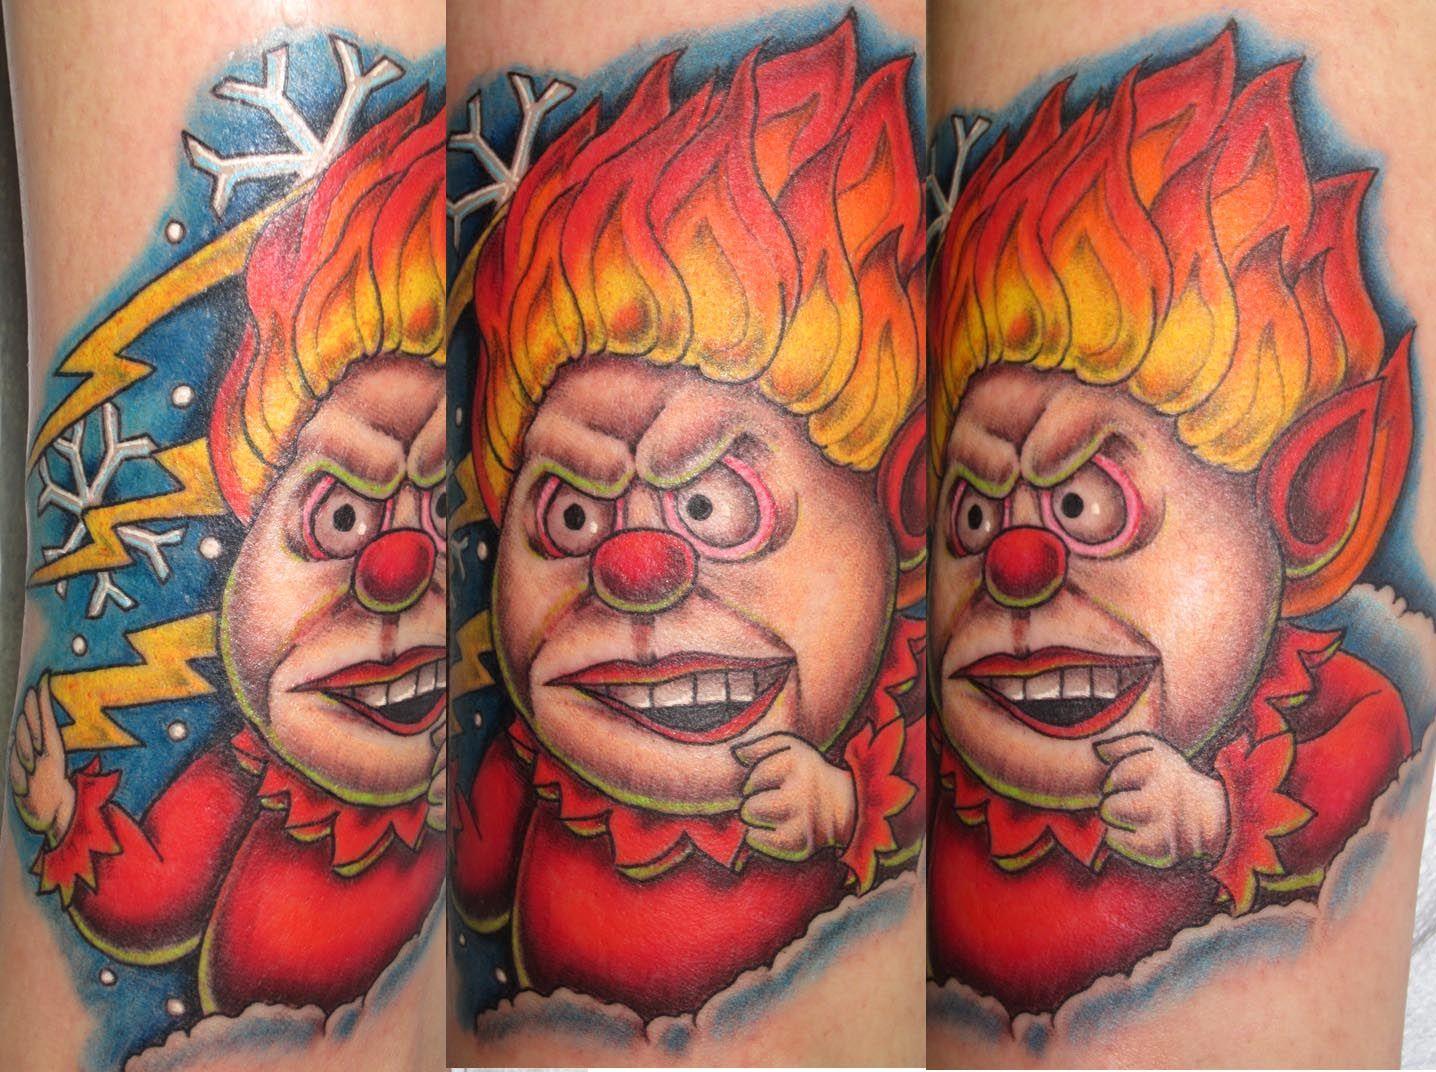 Heat miser tattoo by lisa murphy wwwagainstthegraintattoo